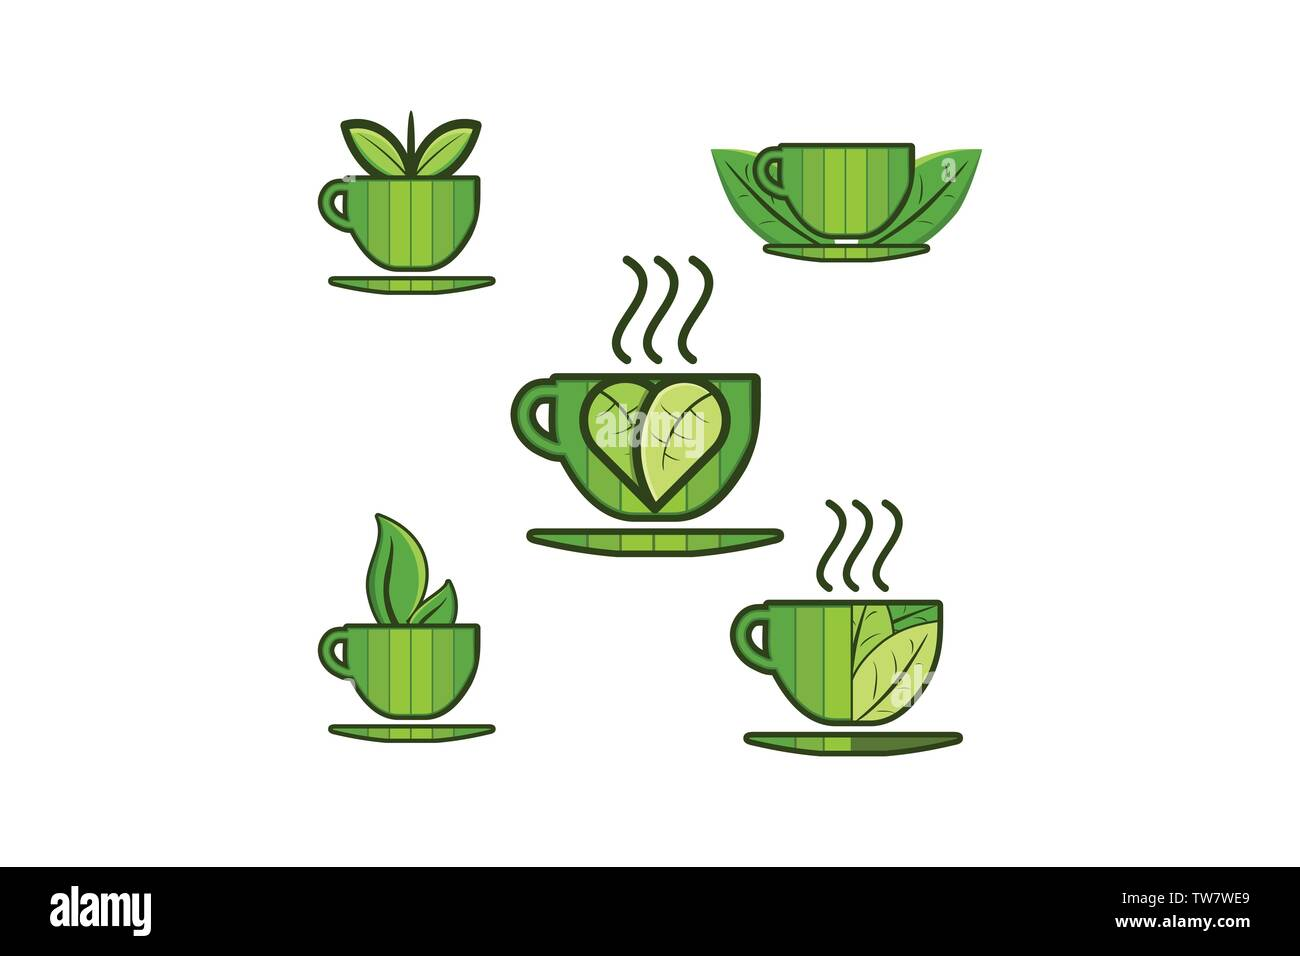 set mug jar cup leaf logo designs inspiration isolated on white background stock vector image art alamy alamy